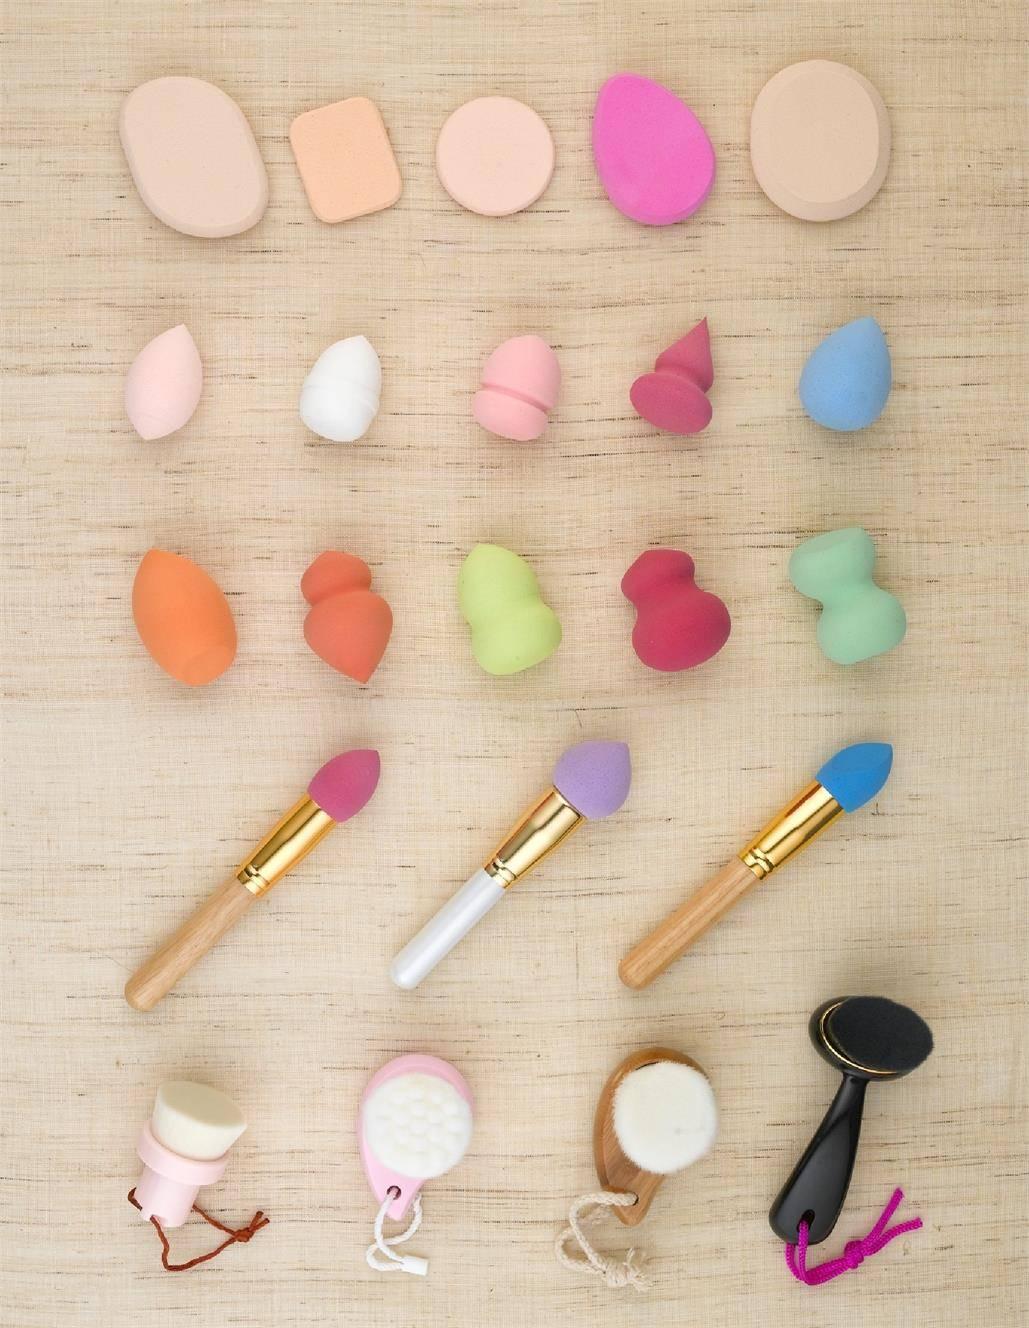 Sponge/ Kabuki Brush/ Beard brush/ Retractable Brushes/ Nail Brushes / Makeup Brush Set